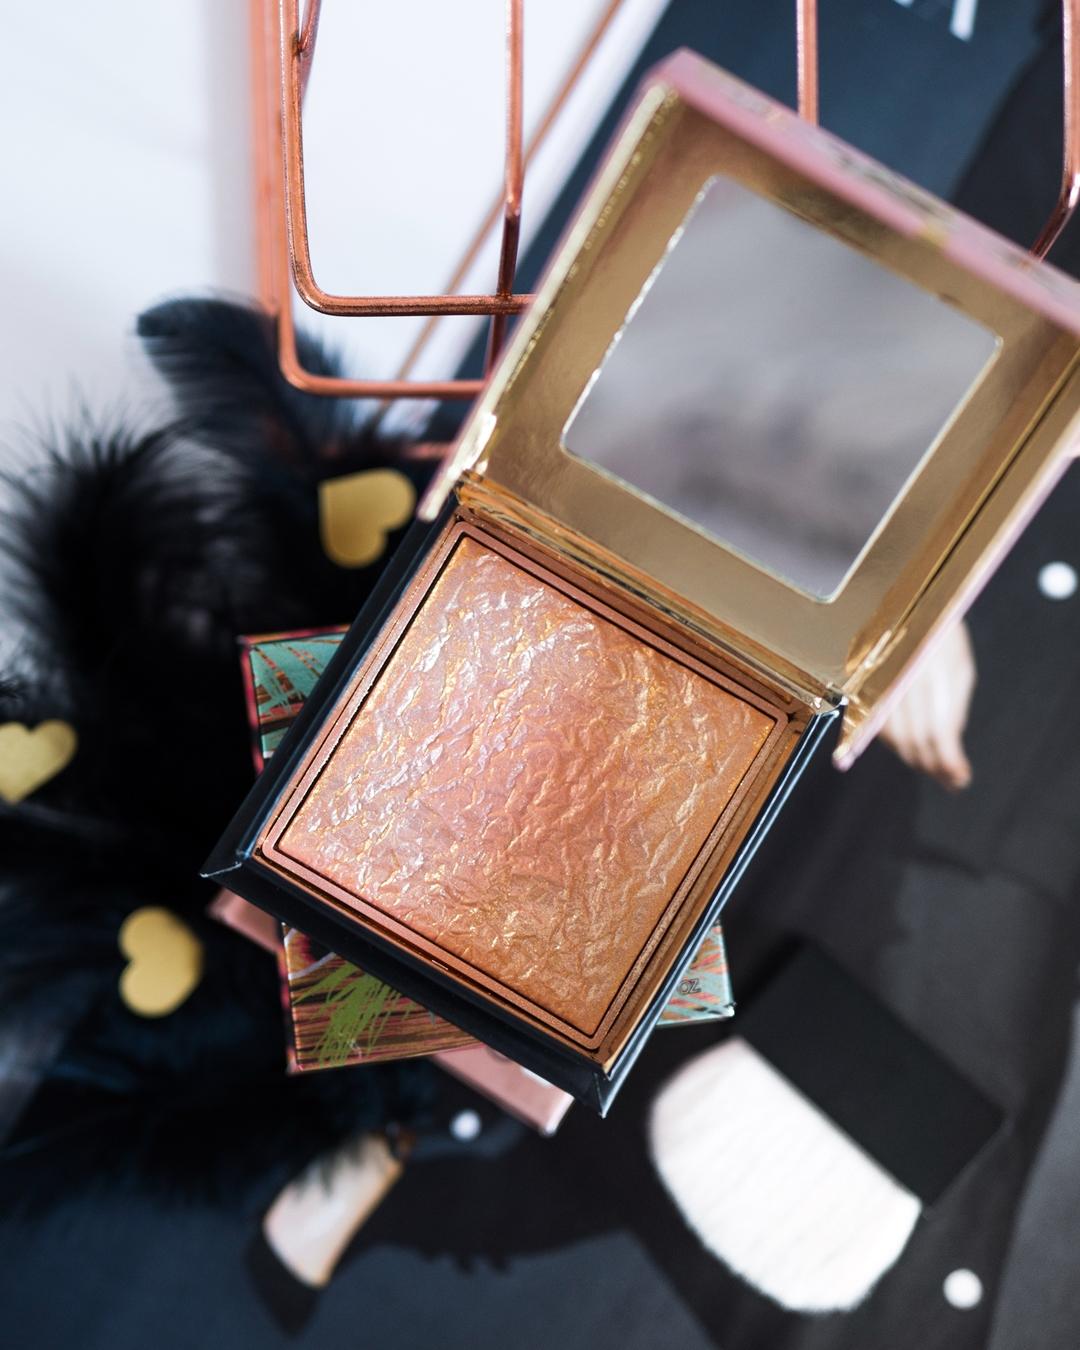 Benefit Gold Rush recenzja makijaż swatche